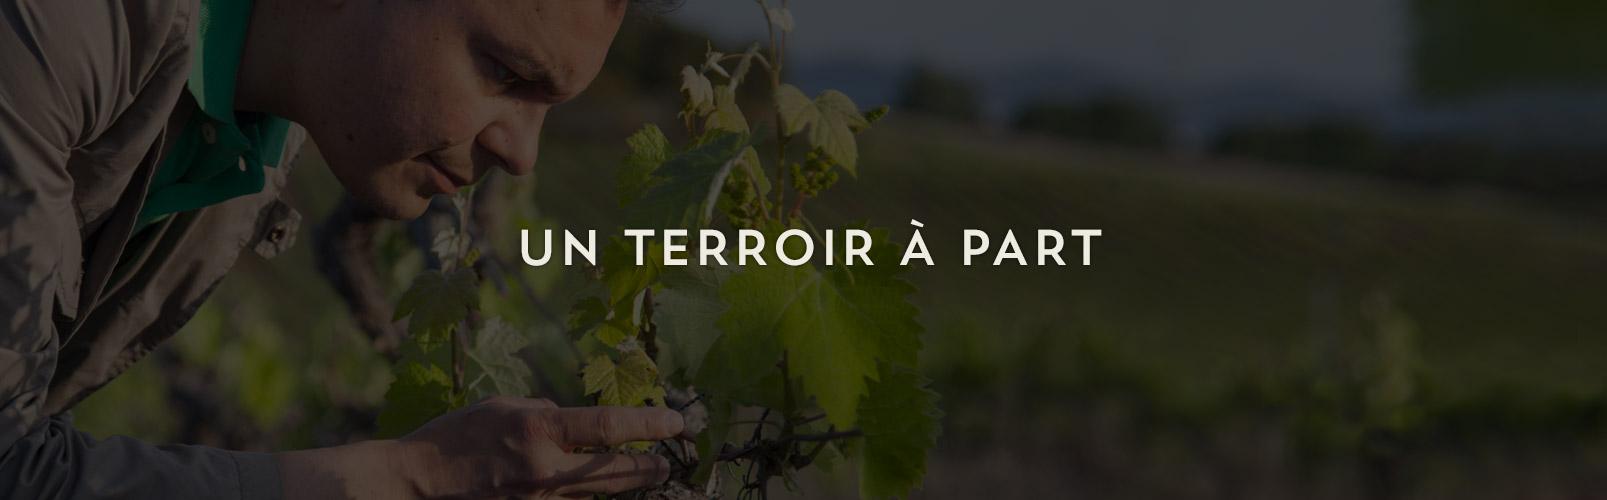 vin-chateau-bormettes-slider-10